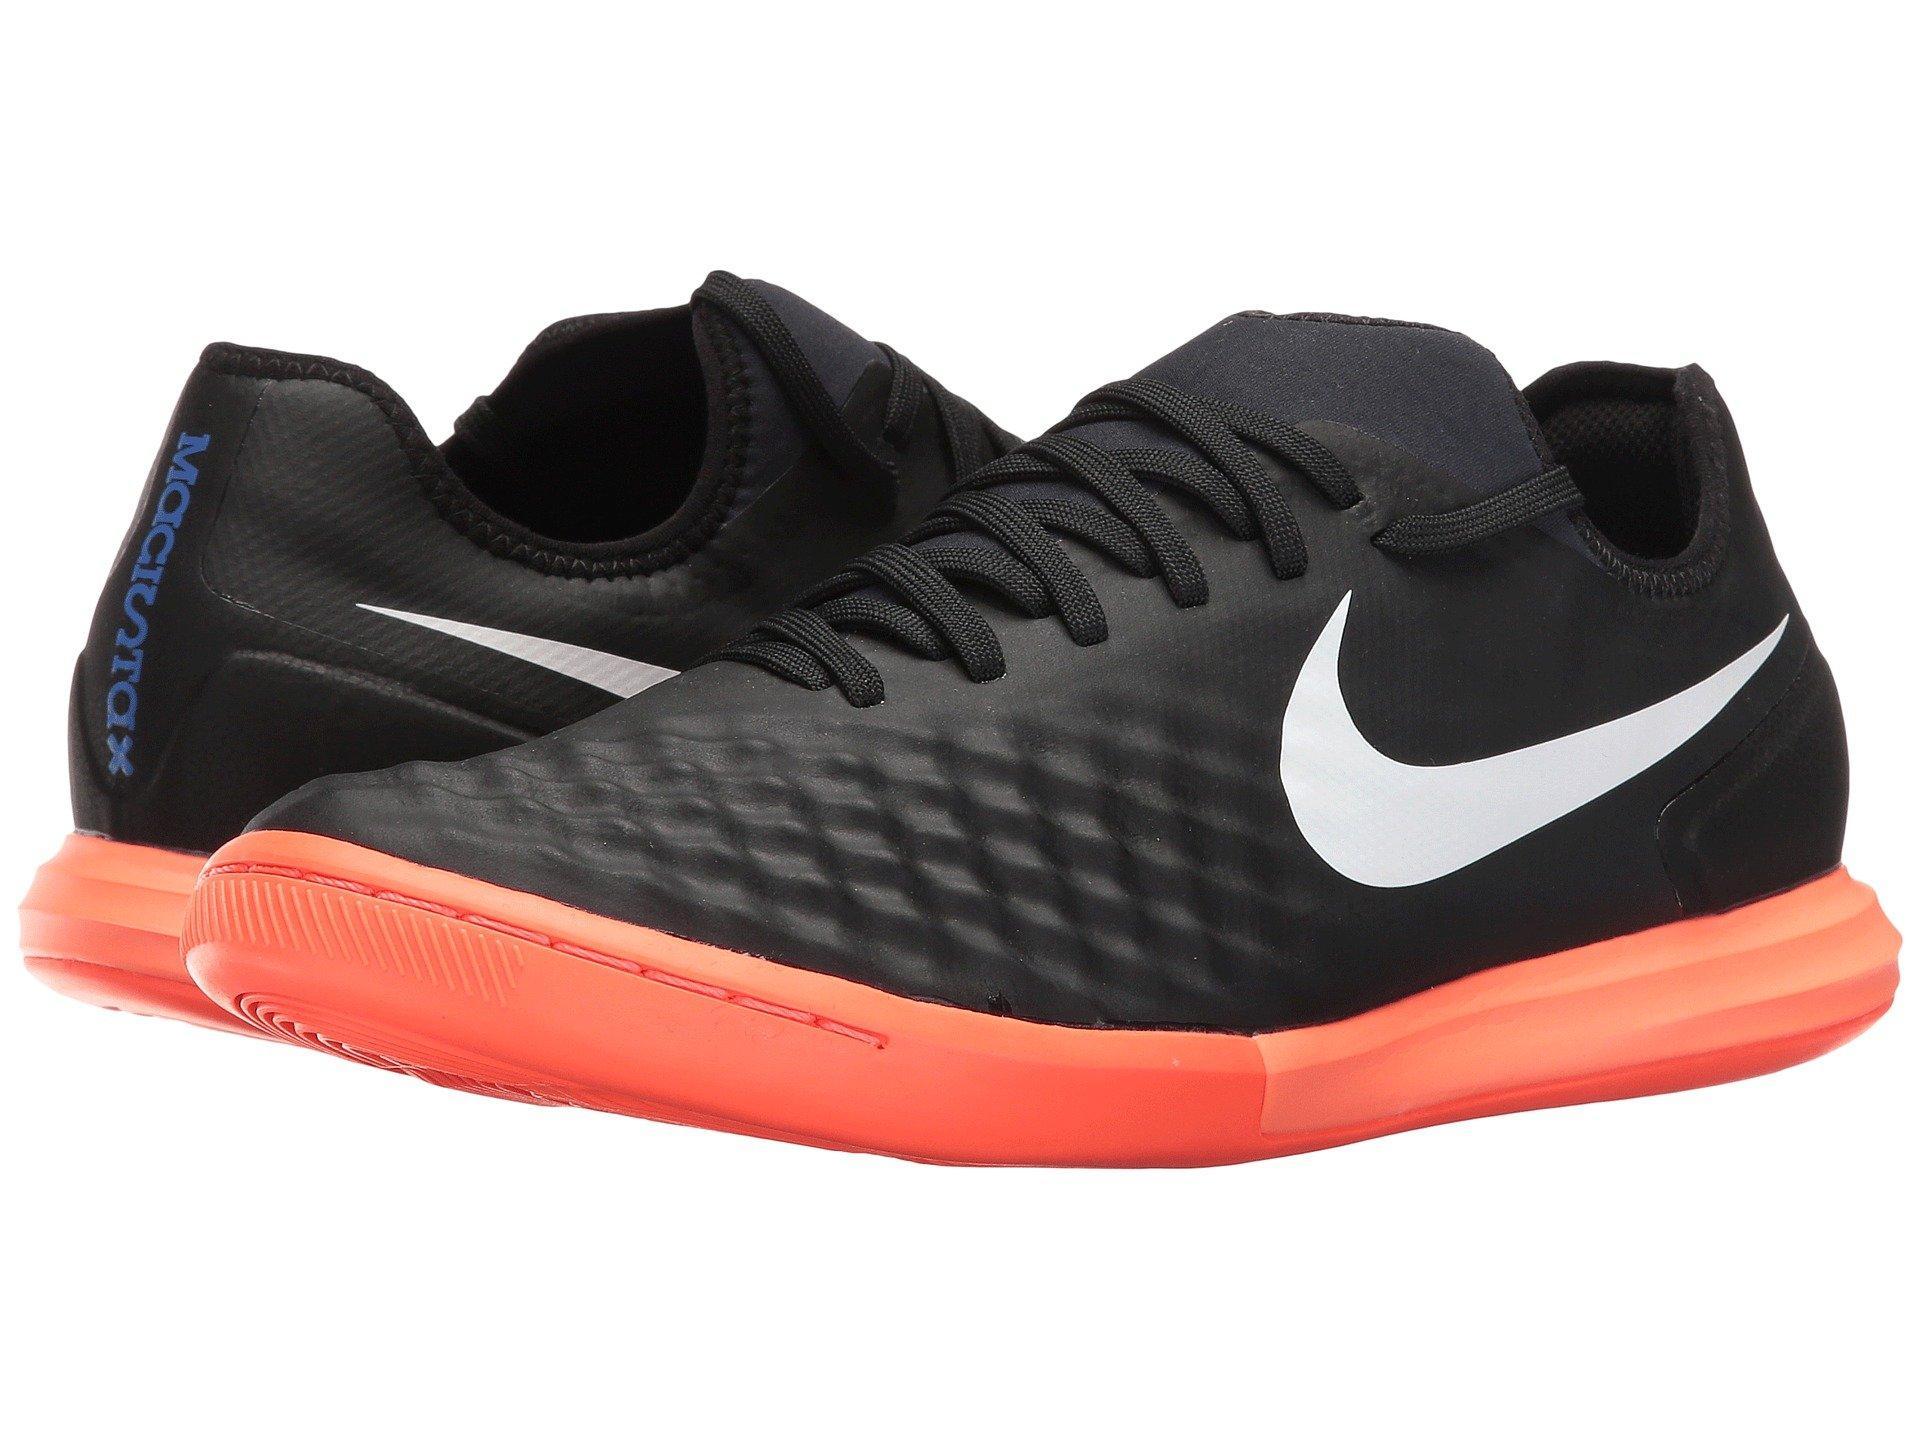 dc584e704713 Nike Magistax Finale Ii Ic In Black White Hyper Orange Paramount Blue